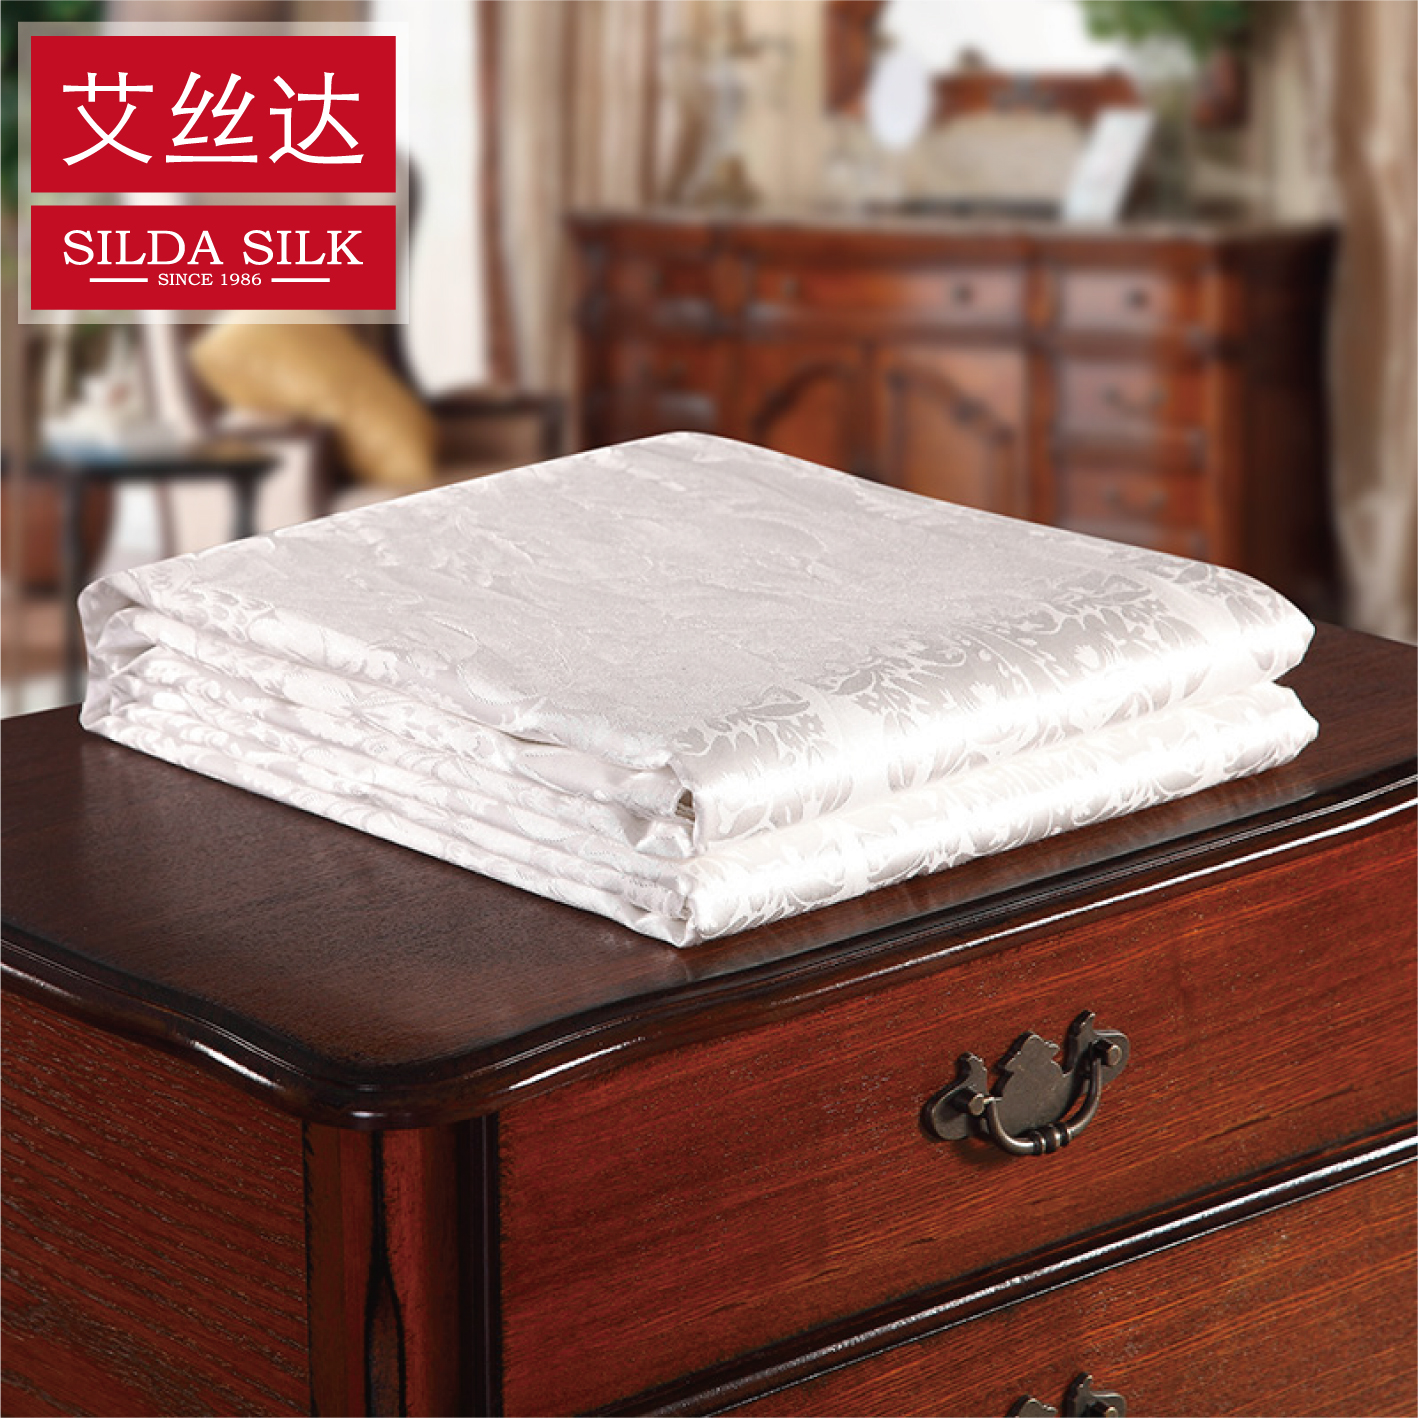 silda丝棉被套SZBT01001